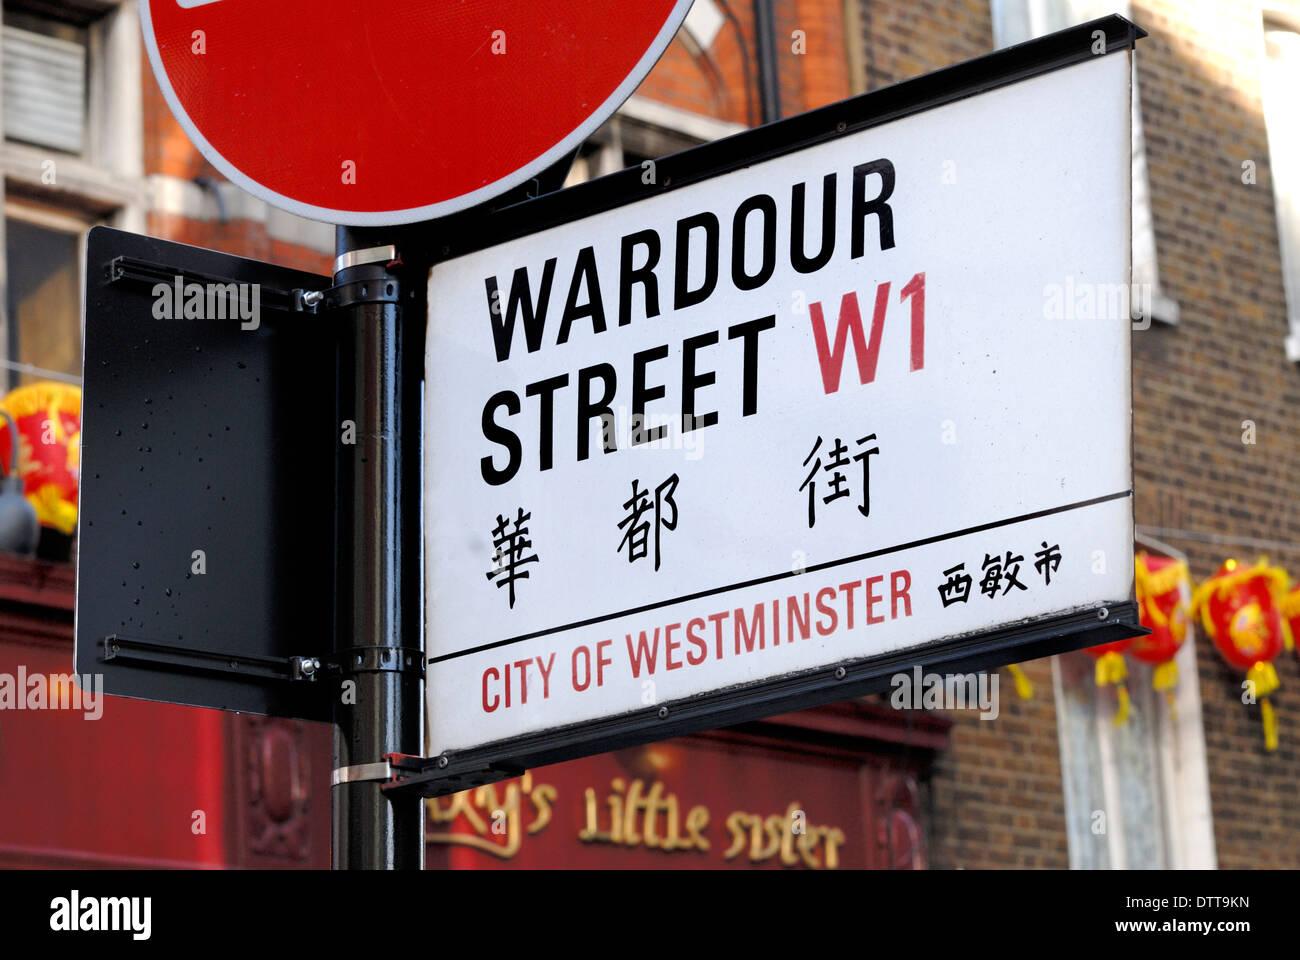 London, England, UK. Bilingual street sign in Chinatown - Wardour Street - Stock Image